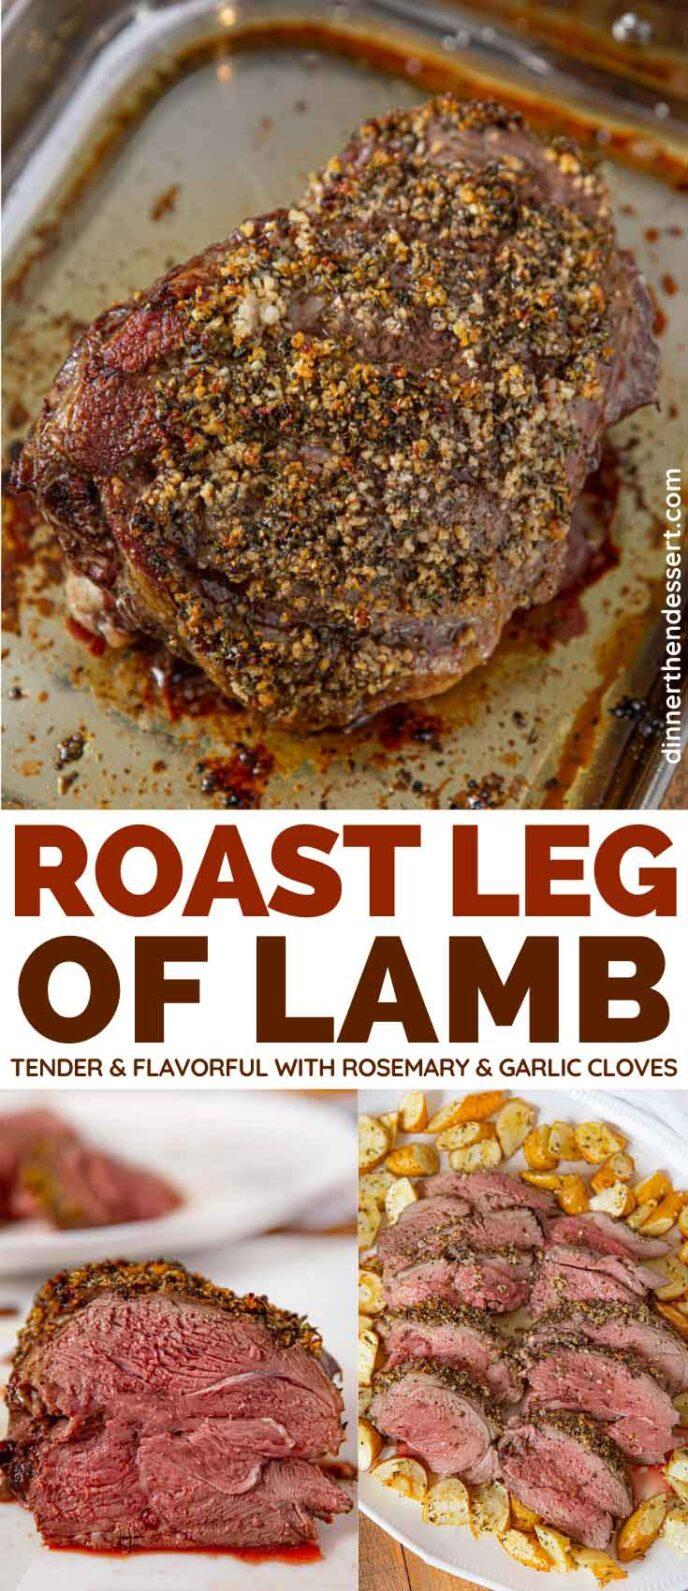 Roast Leg of Lamb collage